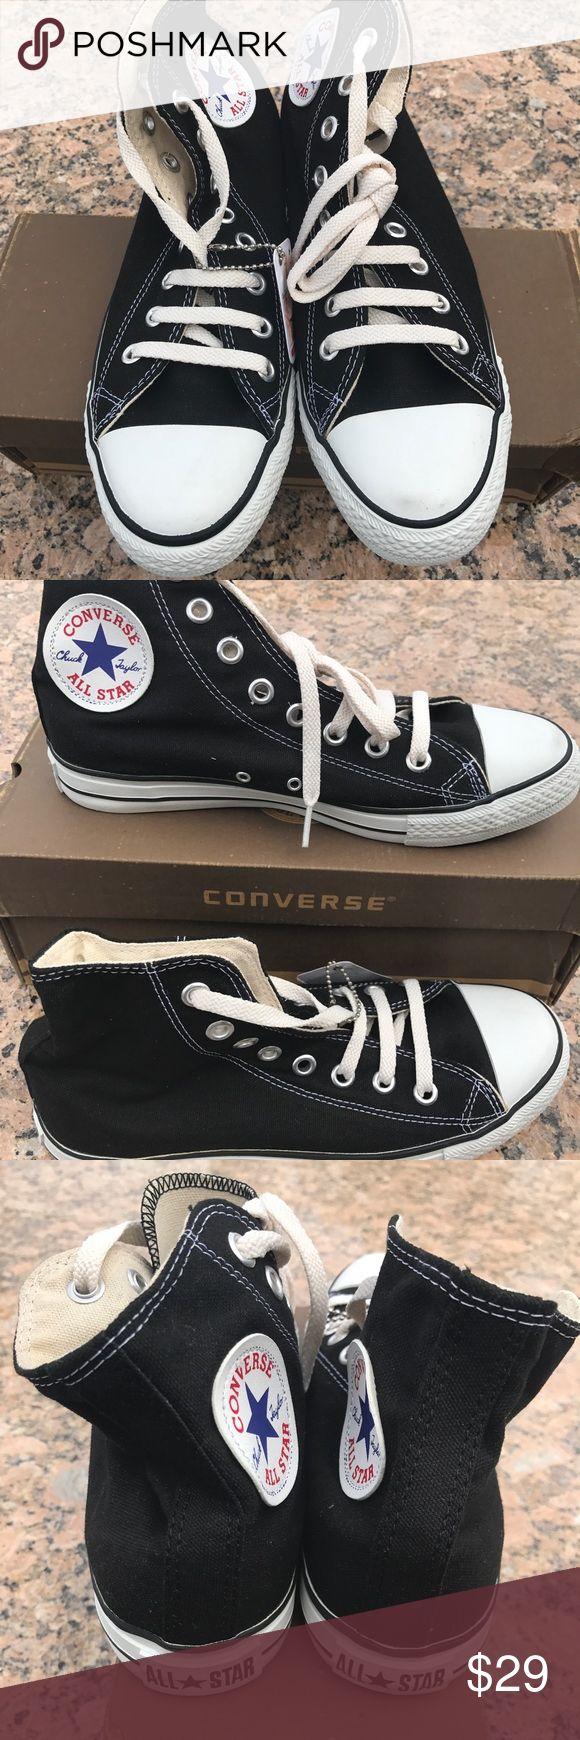 Converse All Star Canvas Hi Top Black Shoes, Converse All Star Canvas Hi Top Black Chuck Taylor Shoes, Women's US 8.5 Converse Shoes